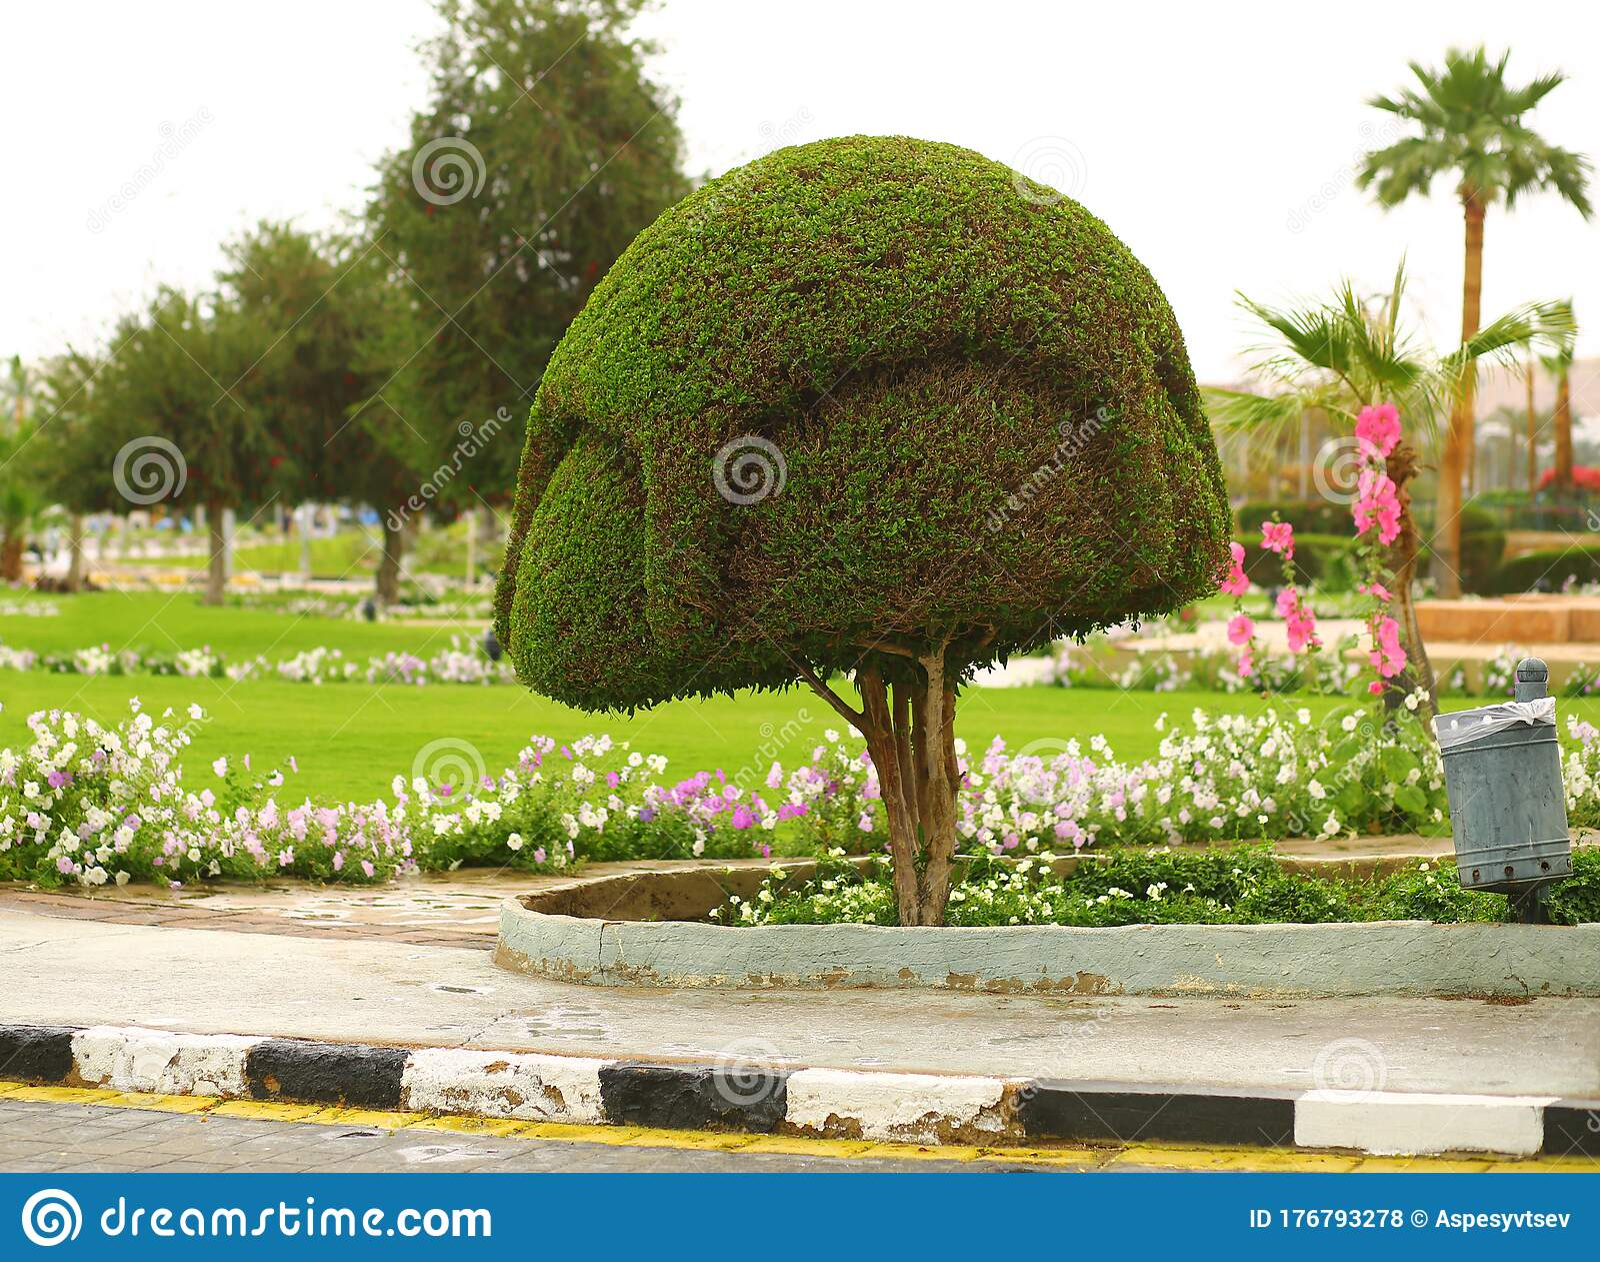 Creative Art Shape Topiary Tree Gardening Landscape Design Stock Photo Image Of Leaf Circle 176793278